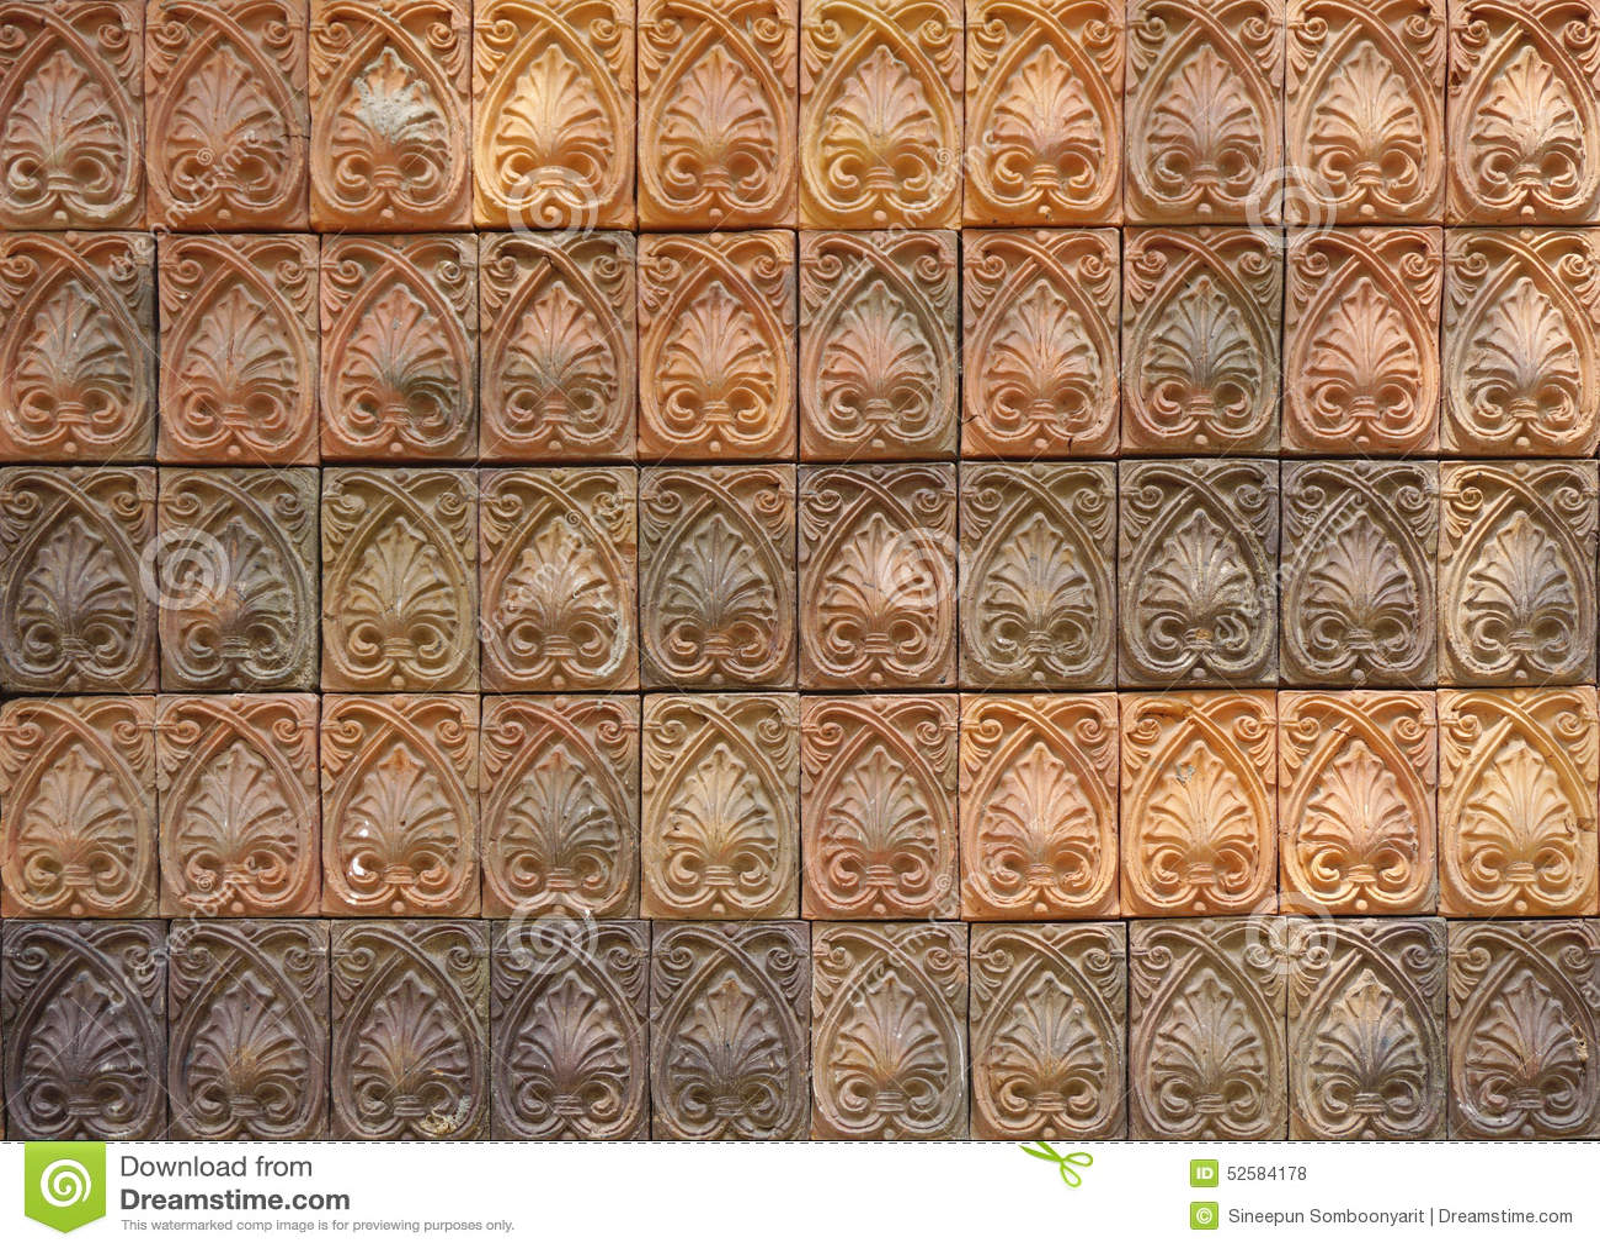 decorative orange tone color terracotta tiles wall stock photo